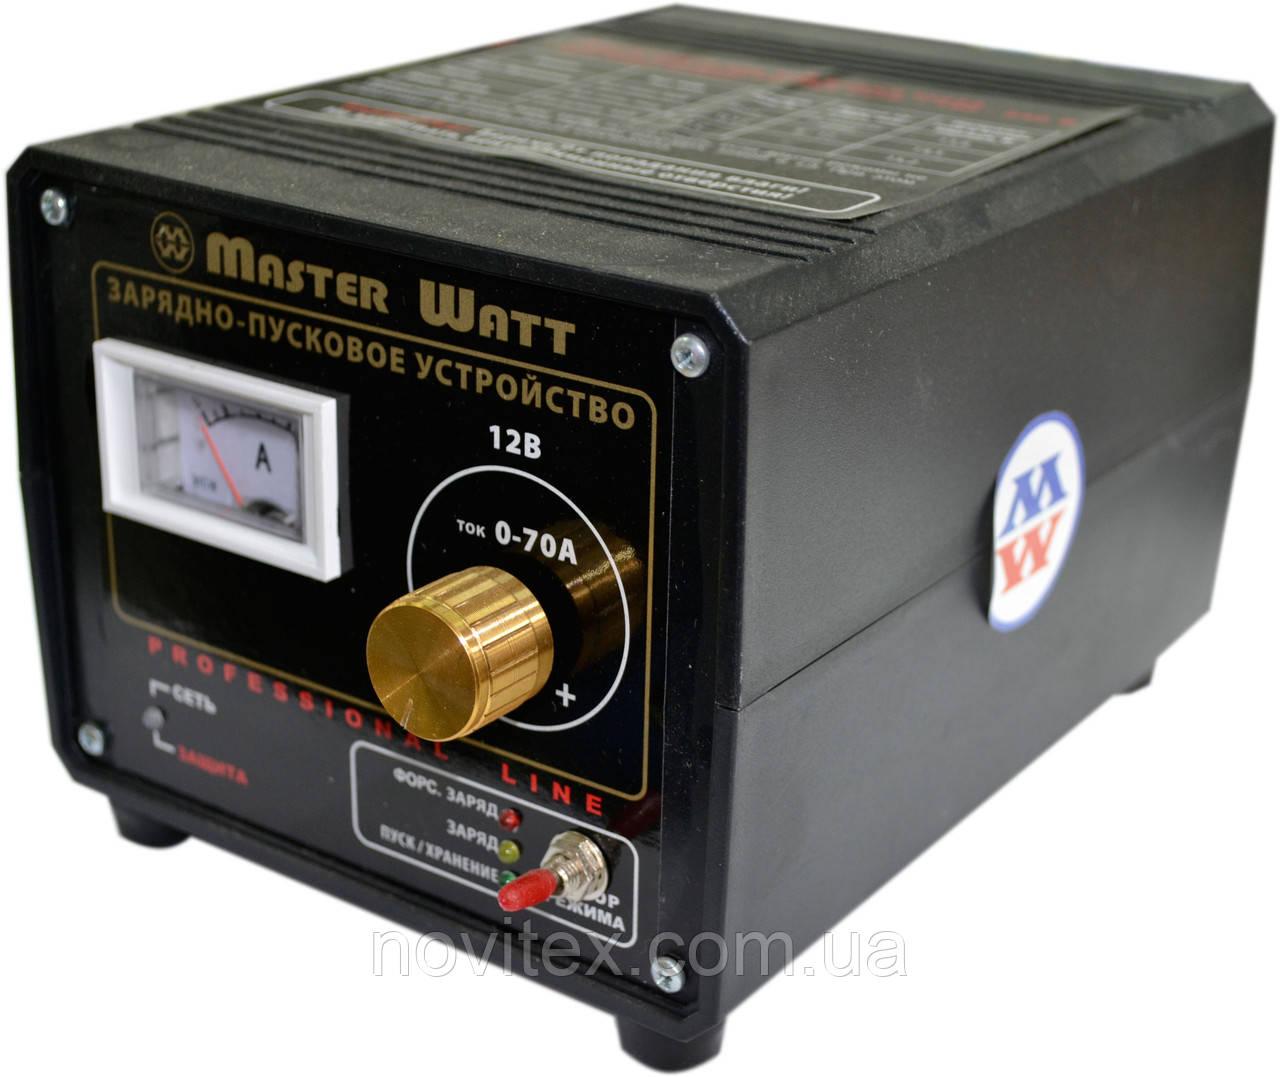 Пуско-зарядное устройство Master Watt 12В 70А 3-х режимное